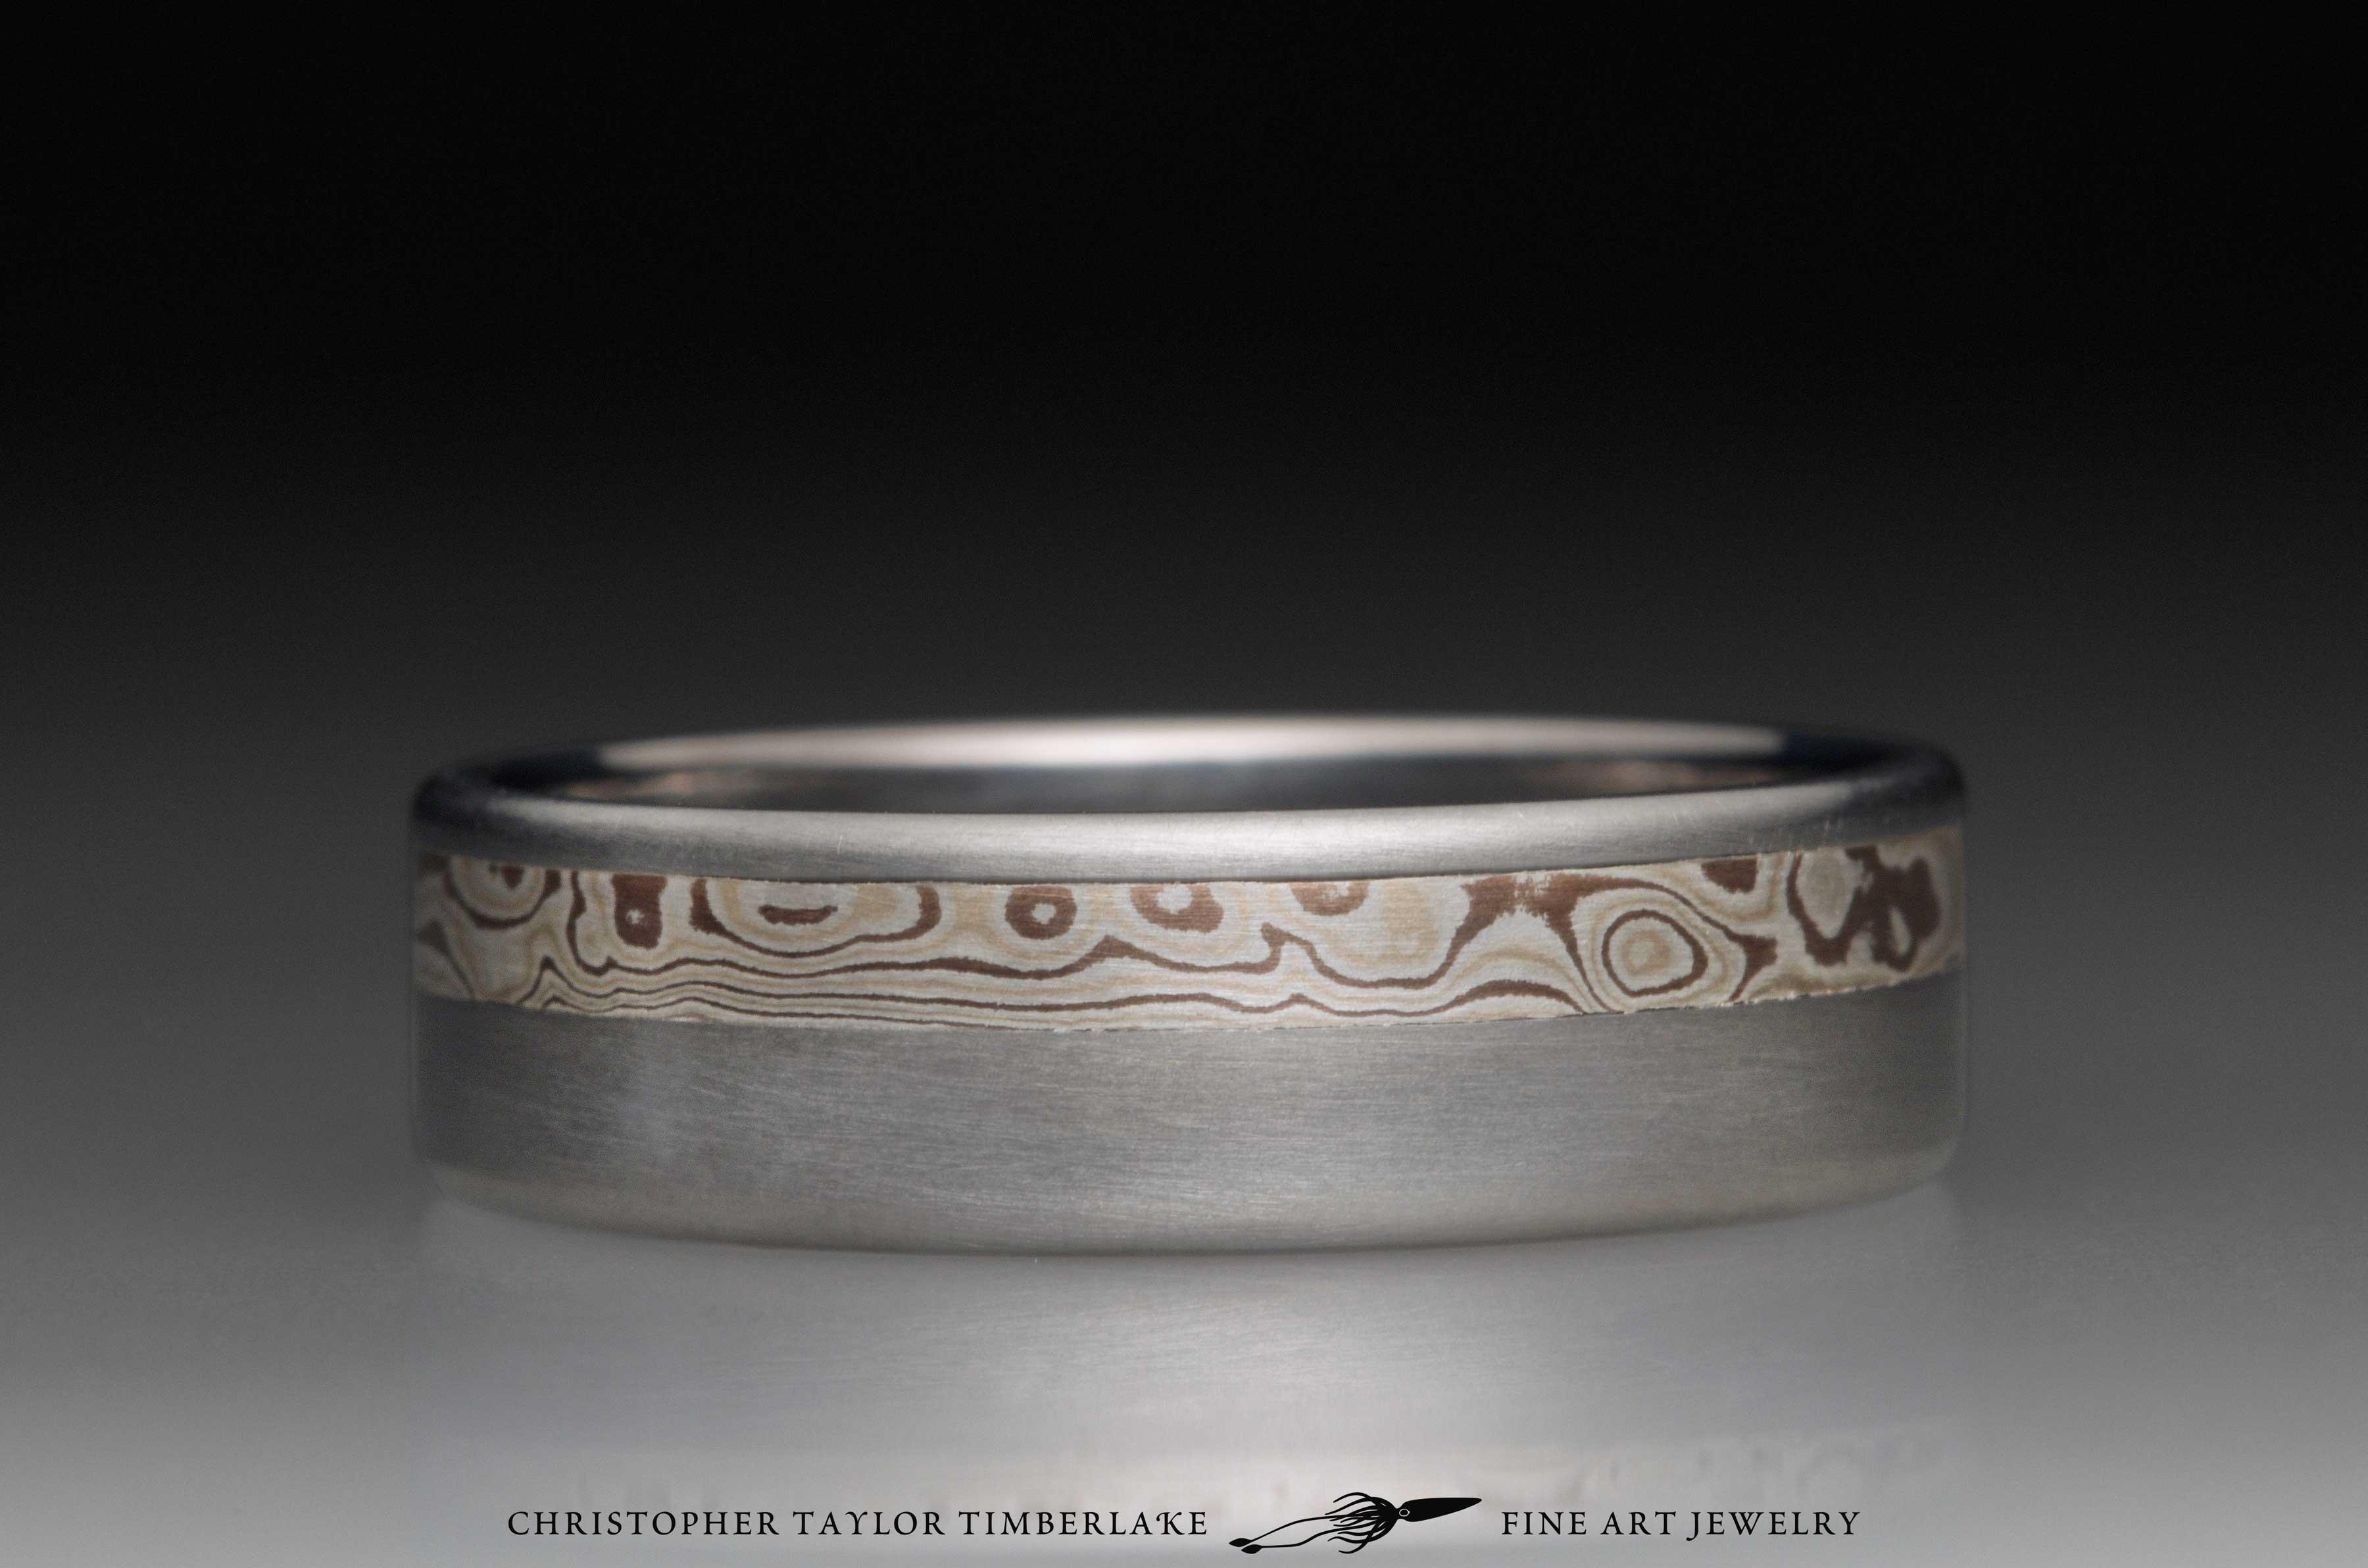 Mokume gane sterling silver, shakudo, and kogane inlay channel in titanium, 6.5mm (3.25-2.25-1) 1